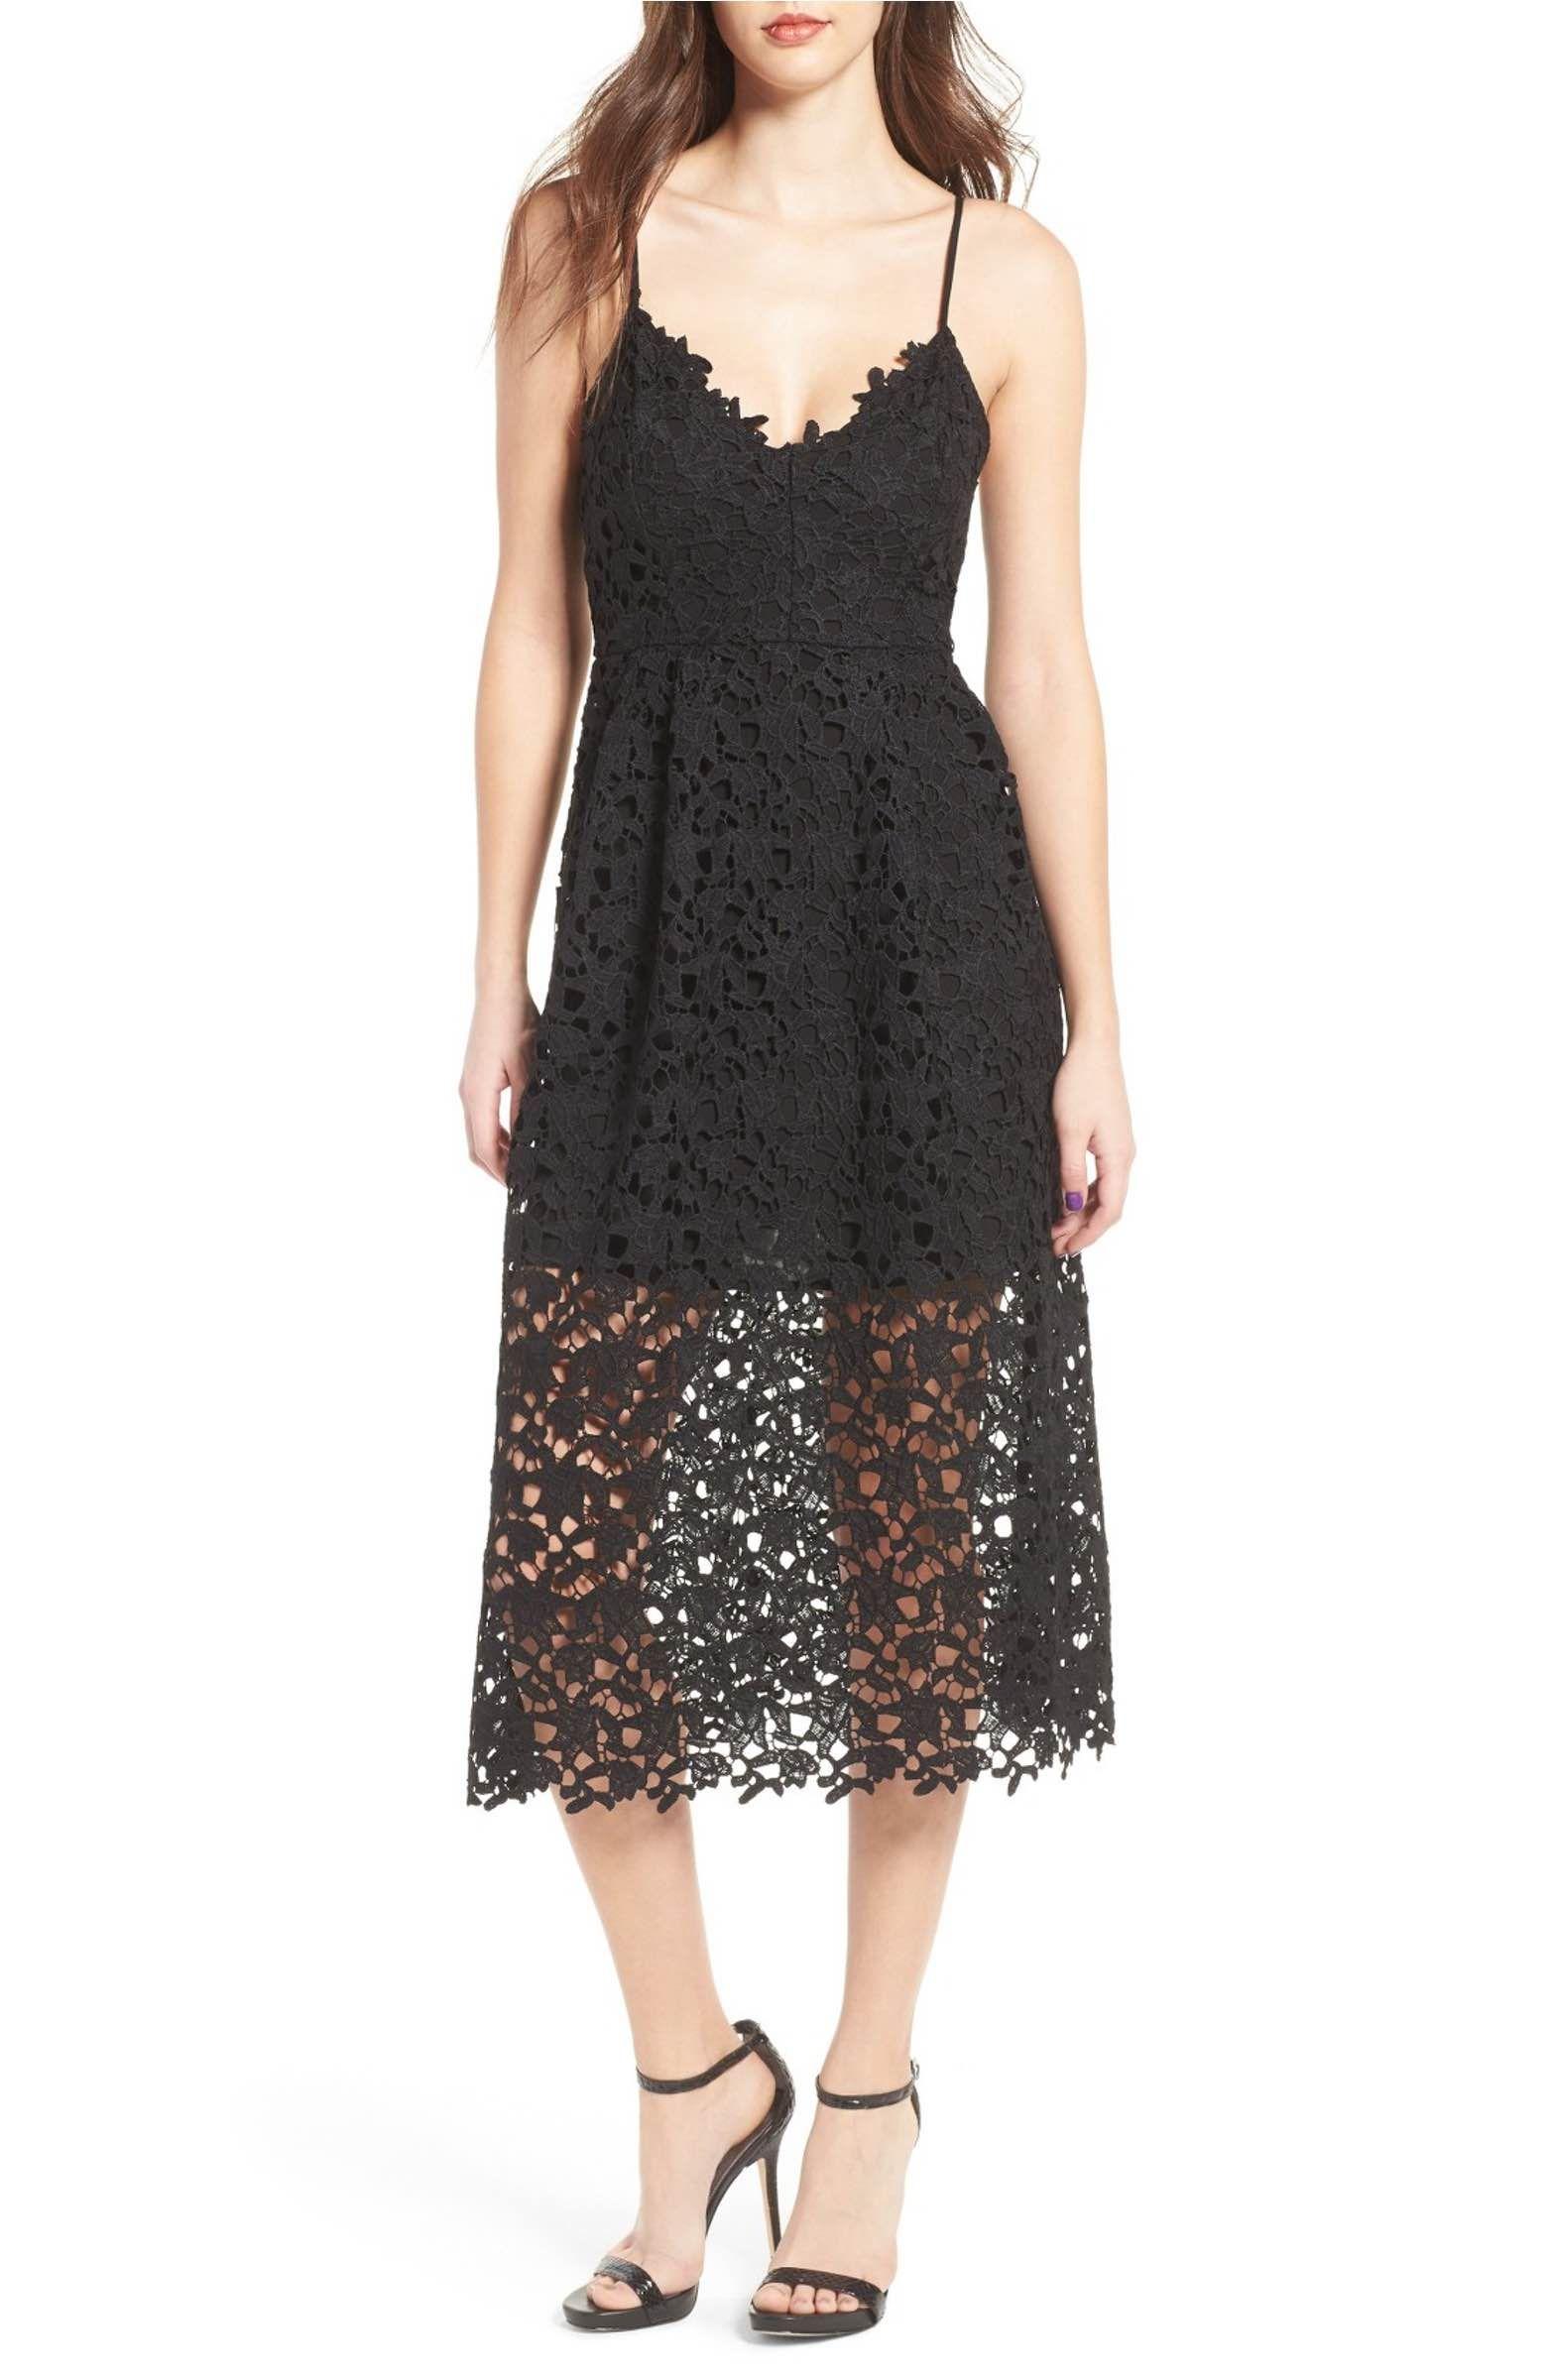 Lace midi dress lace midi dress midi dresses and nordstrom